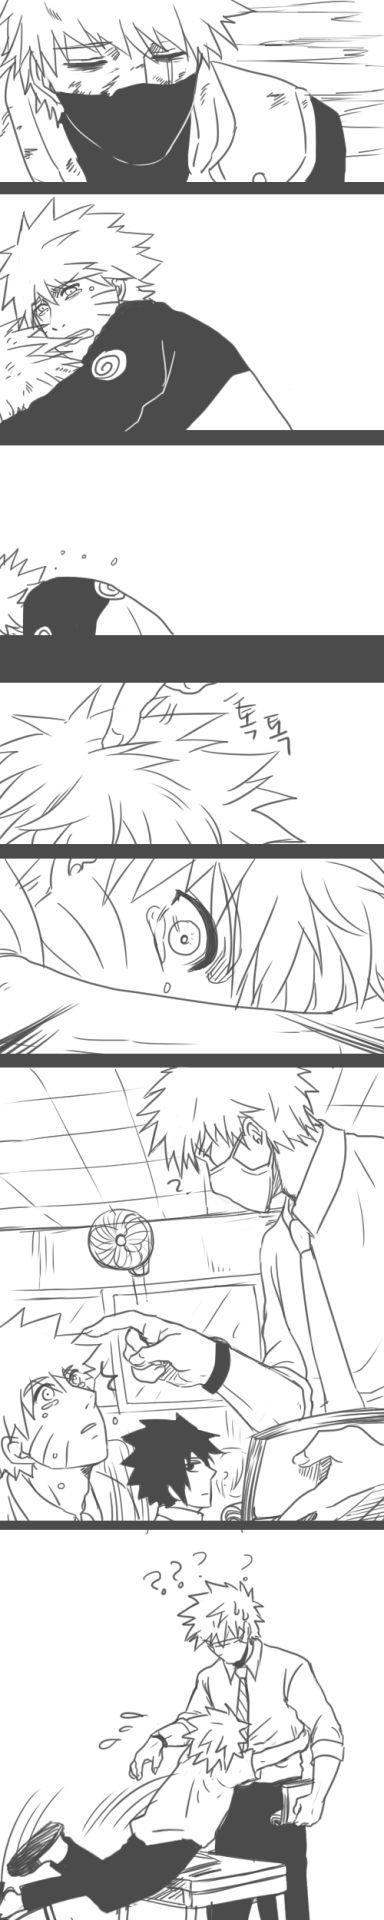 AU high school; student Naruto dreams of the shinobi world where his teacher Kakashi dies. | awww. <3 | slight NaruKaka